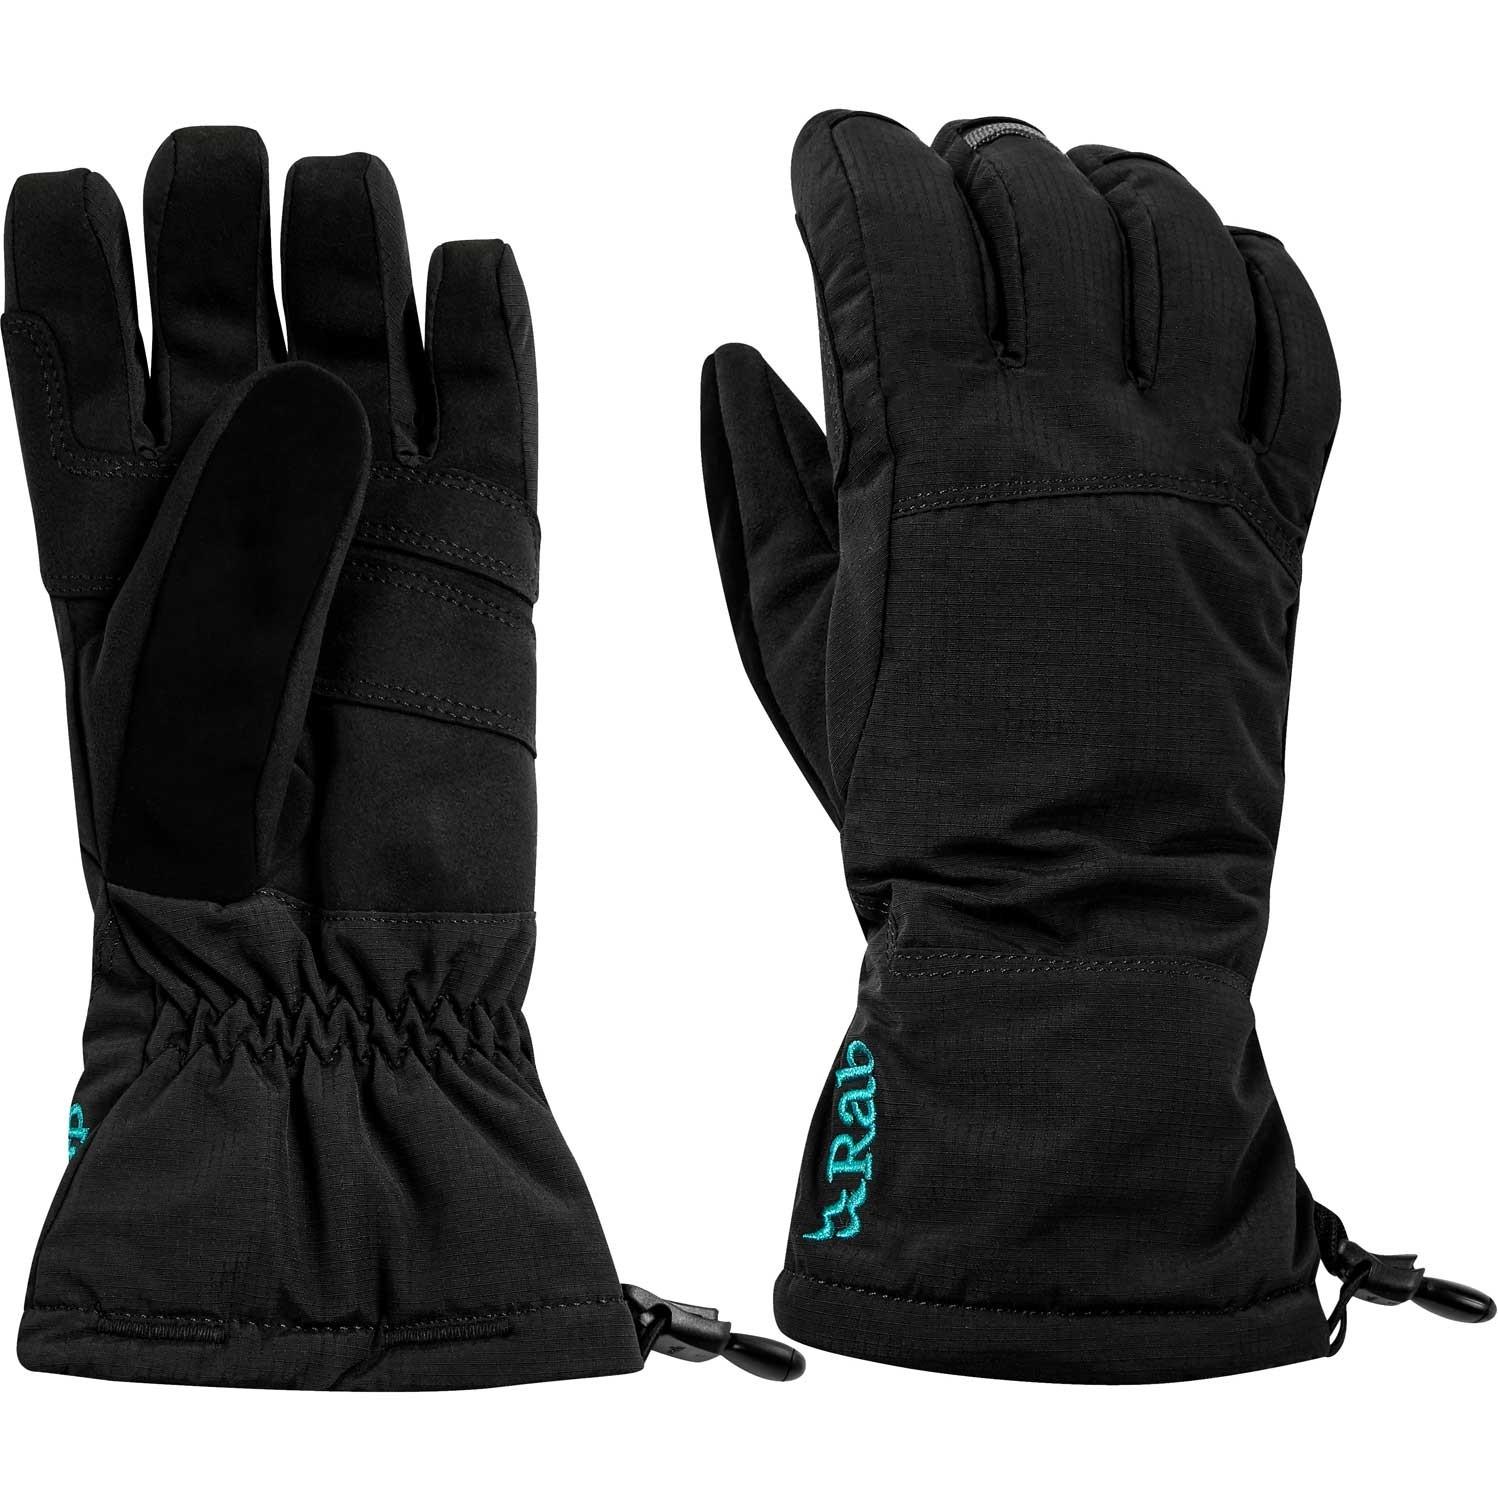 Rab Women's Storm Glove - Black